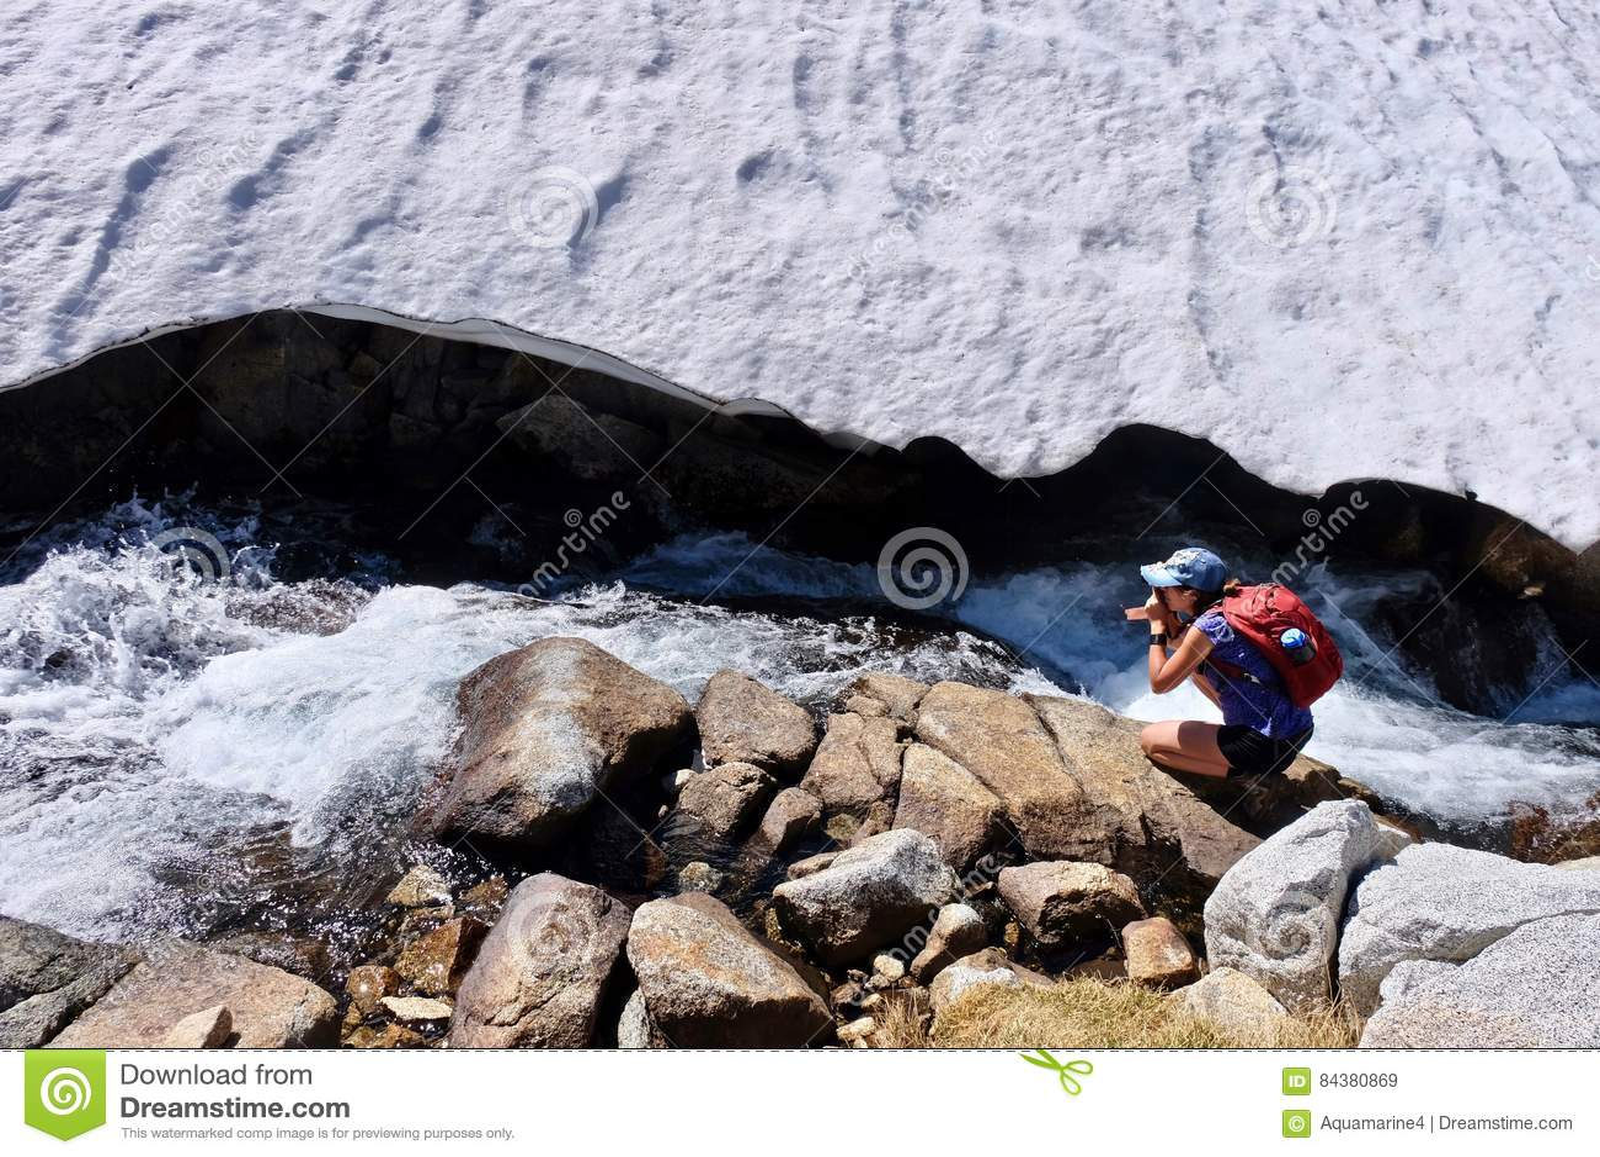 Woman photographer by alpine creek.